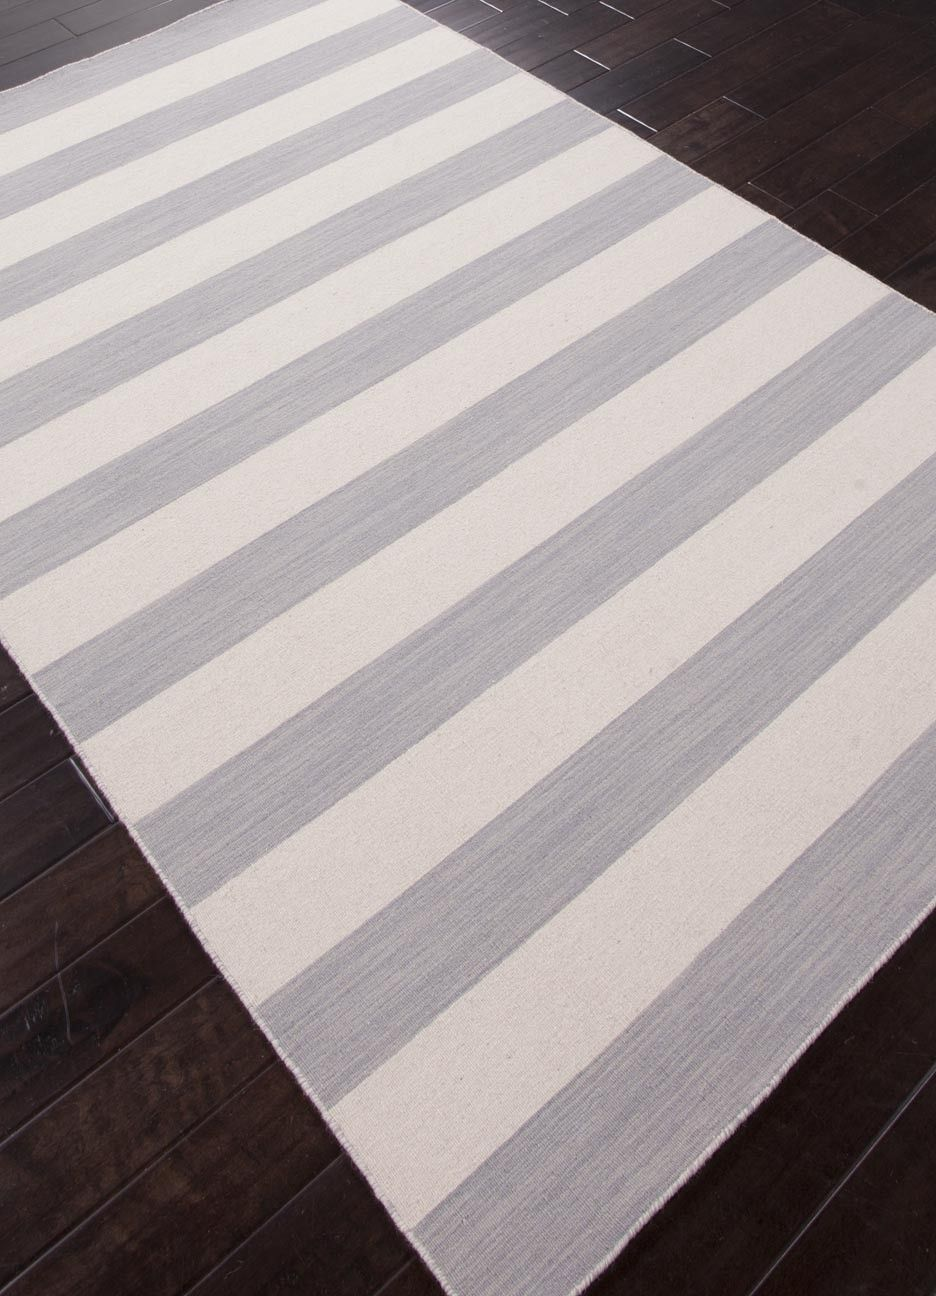 Striped Pura Vida Wool Rug Gray Pura Vida Dias Stripe Rug Bedroom Grey And White Rug Grey Striped Rug